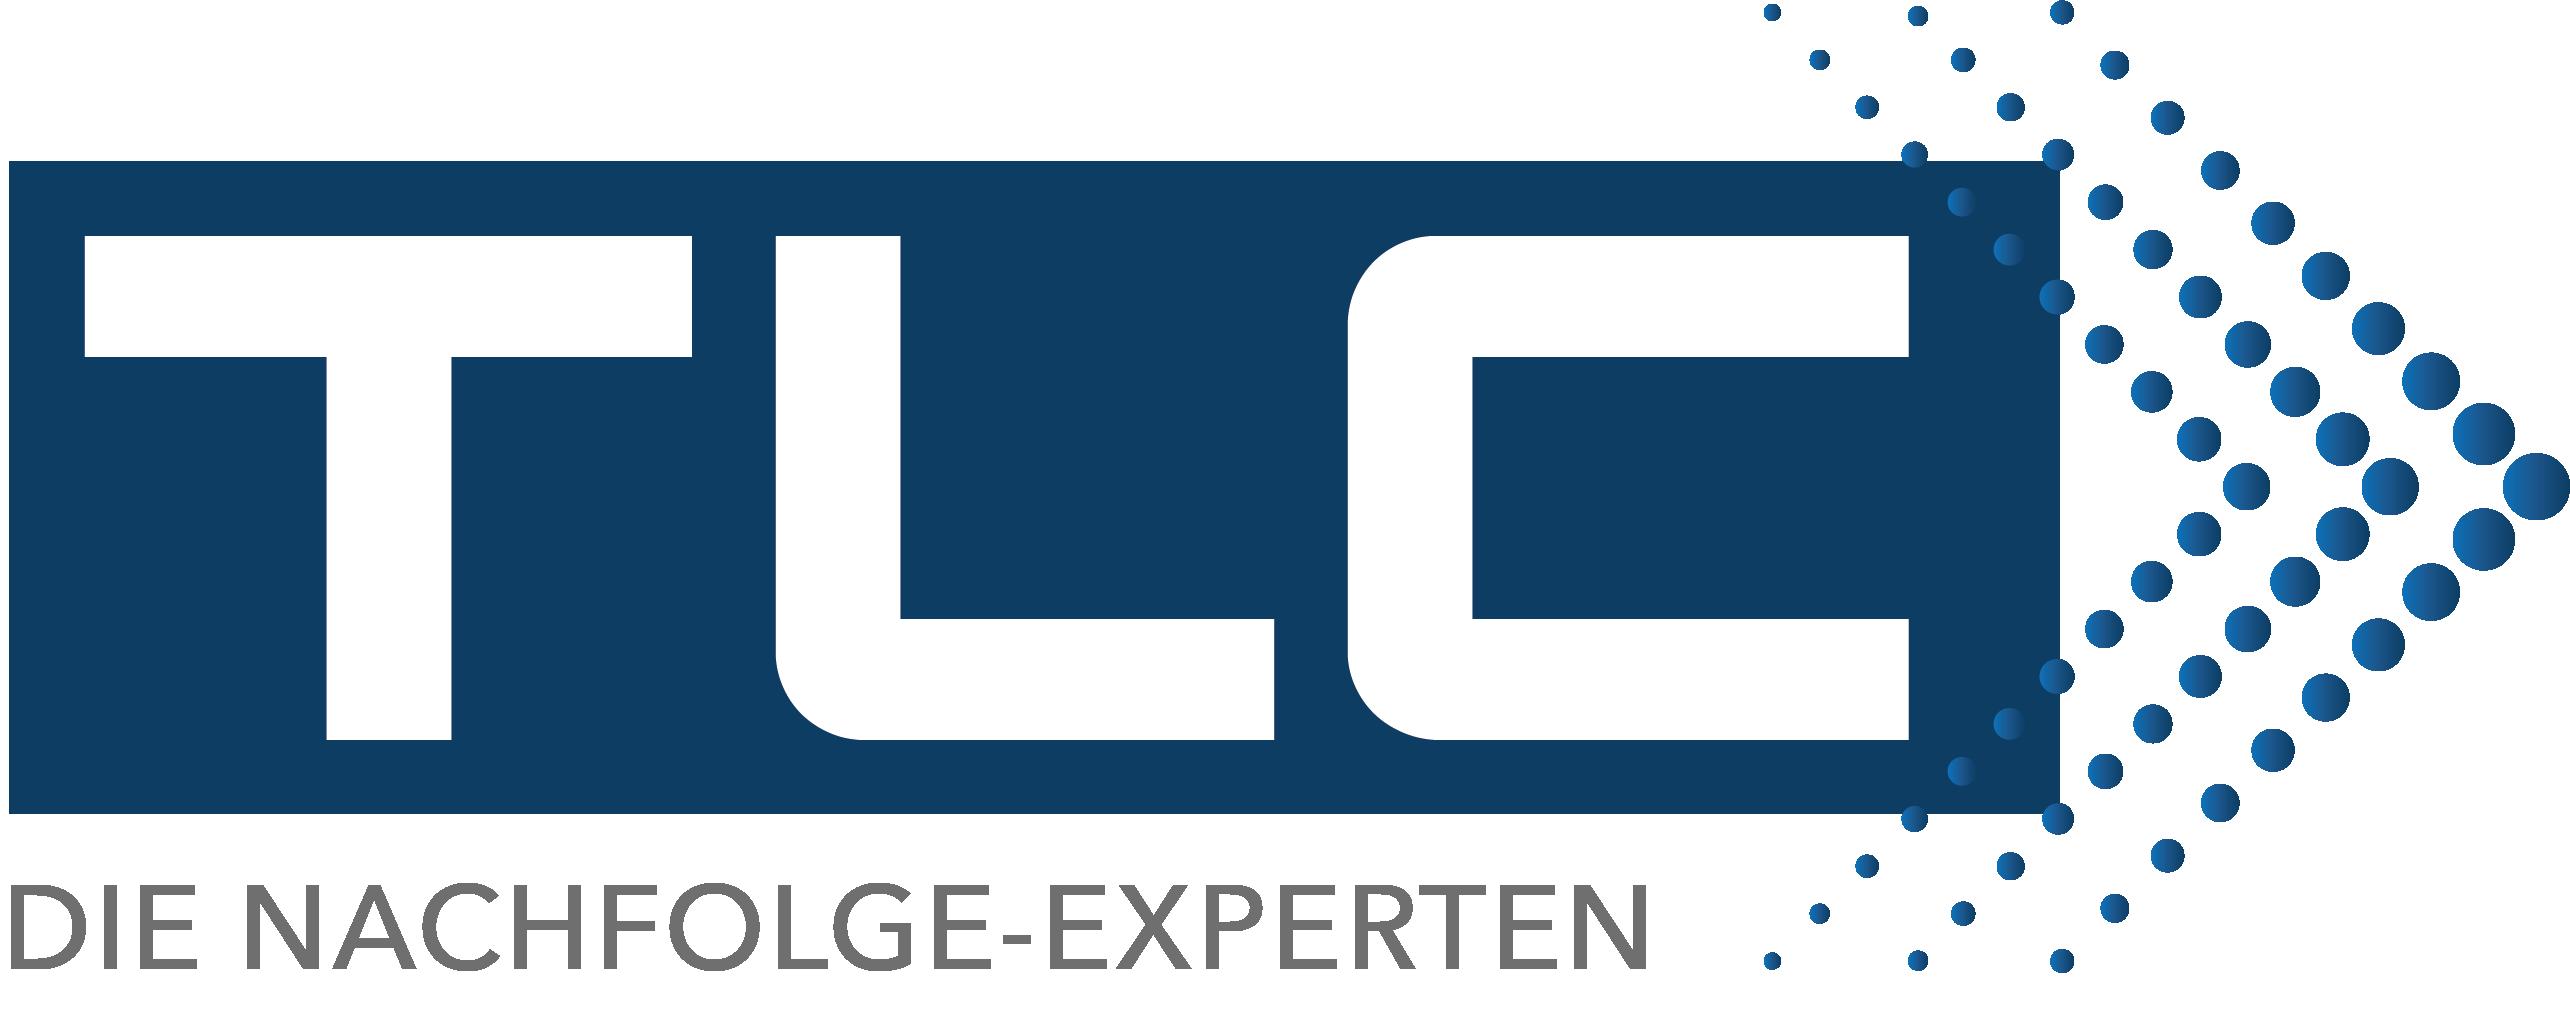 2020-07-15_5f0eaa4dc5f92_logo